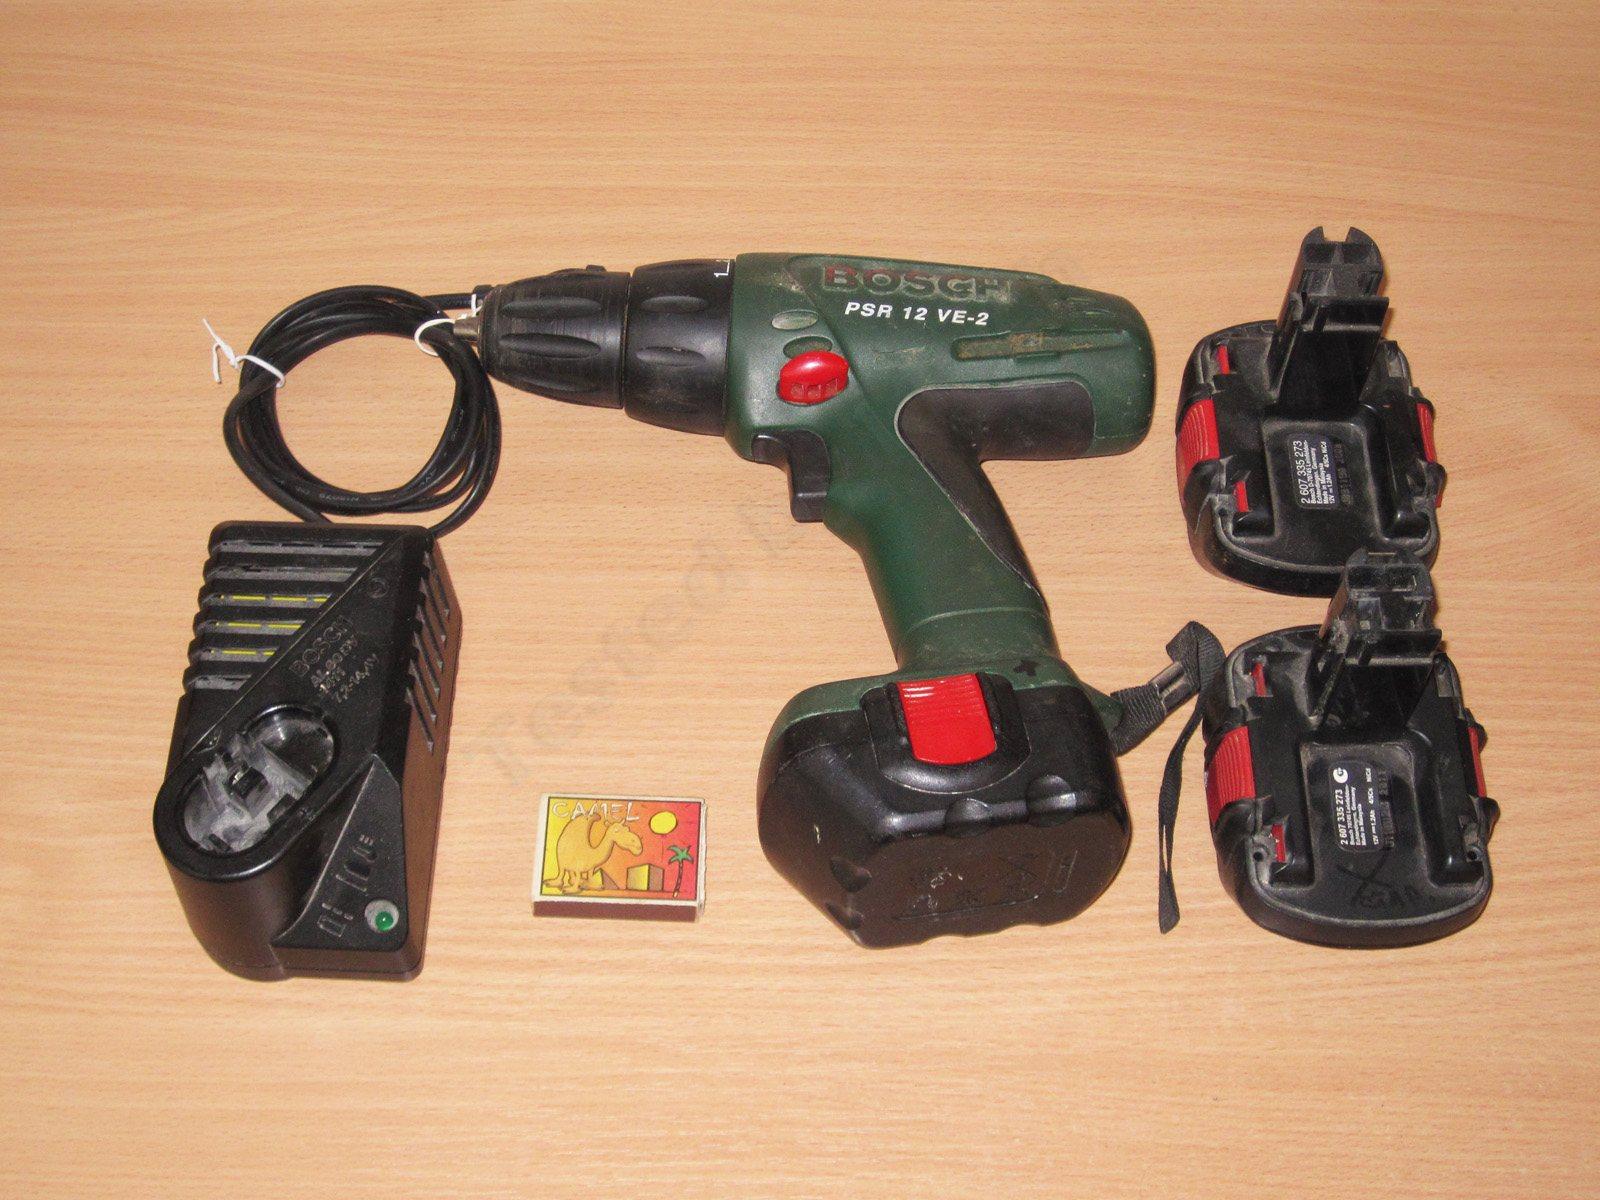 Ремонт li-ion аккумулятора шуруповерта своими руками фото 860